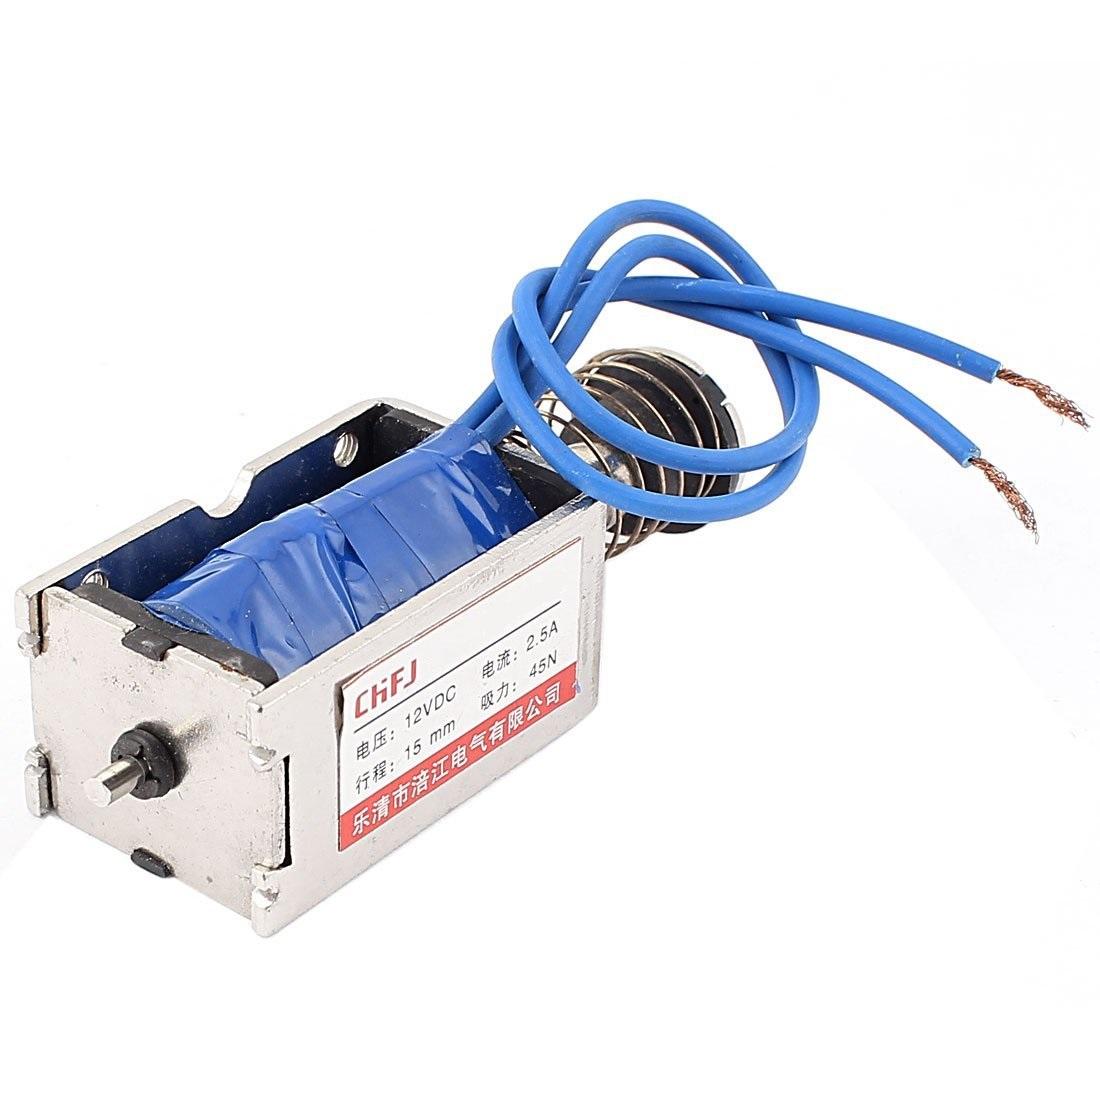 Kp Larger Push Pull Solenoid 12v 3a 15mm Pps123 Fr 239 Kr Hos Phillips Wiring Diagram